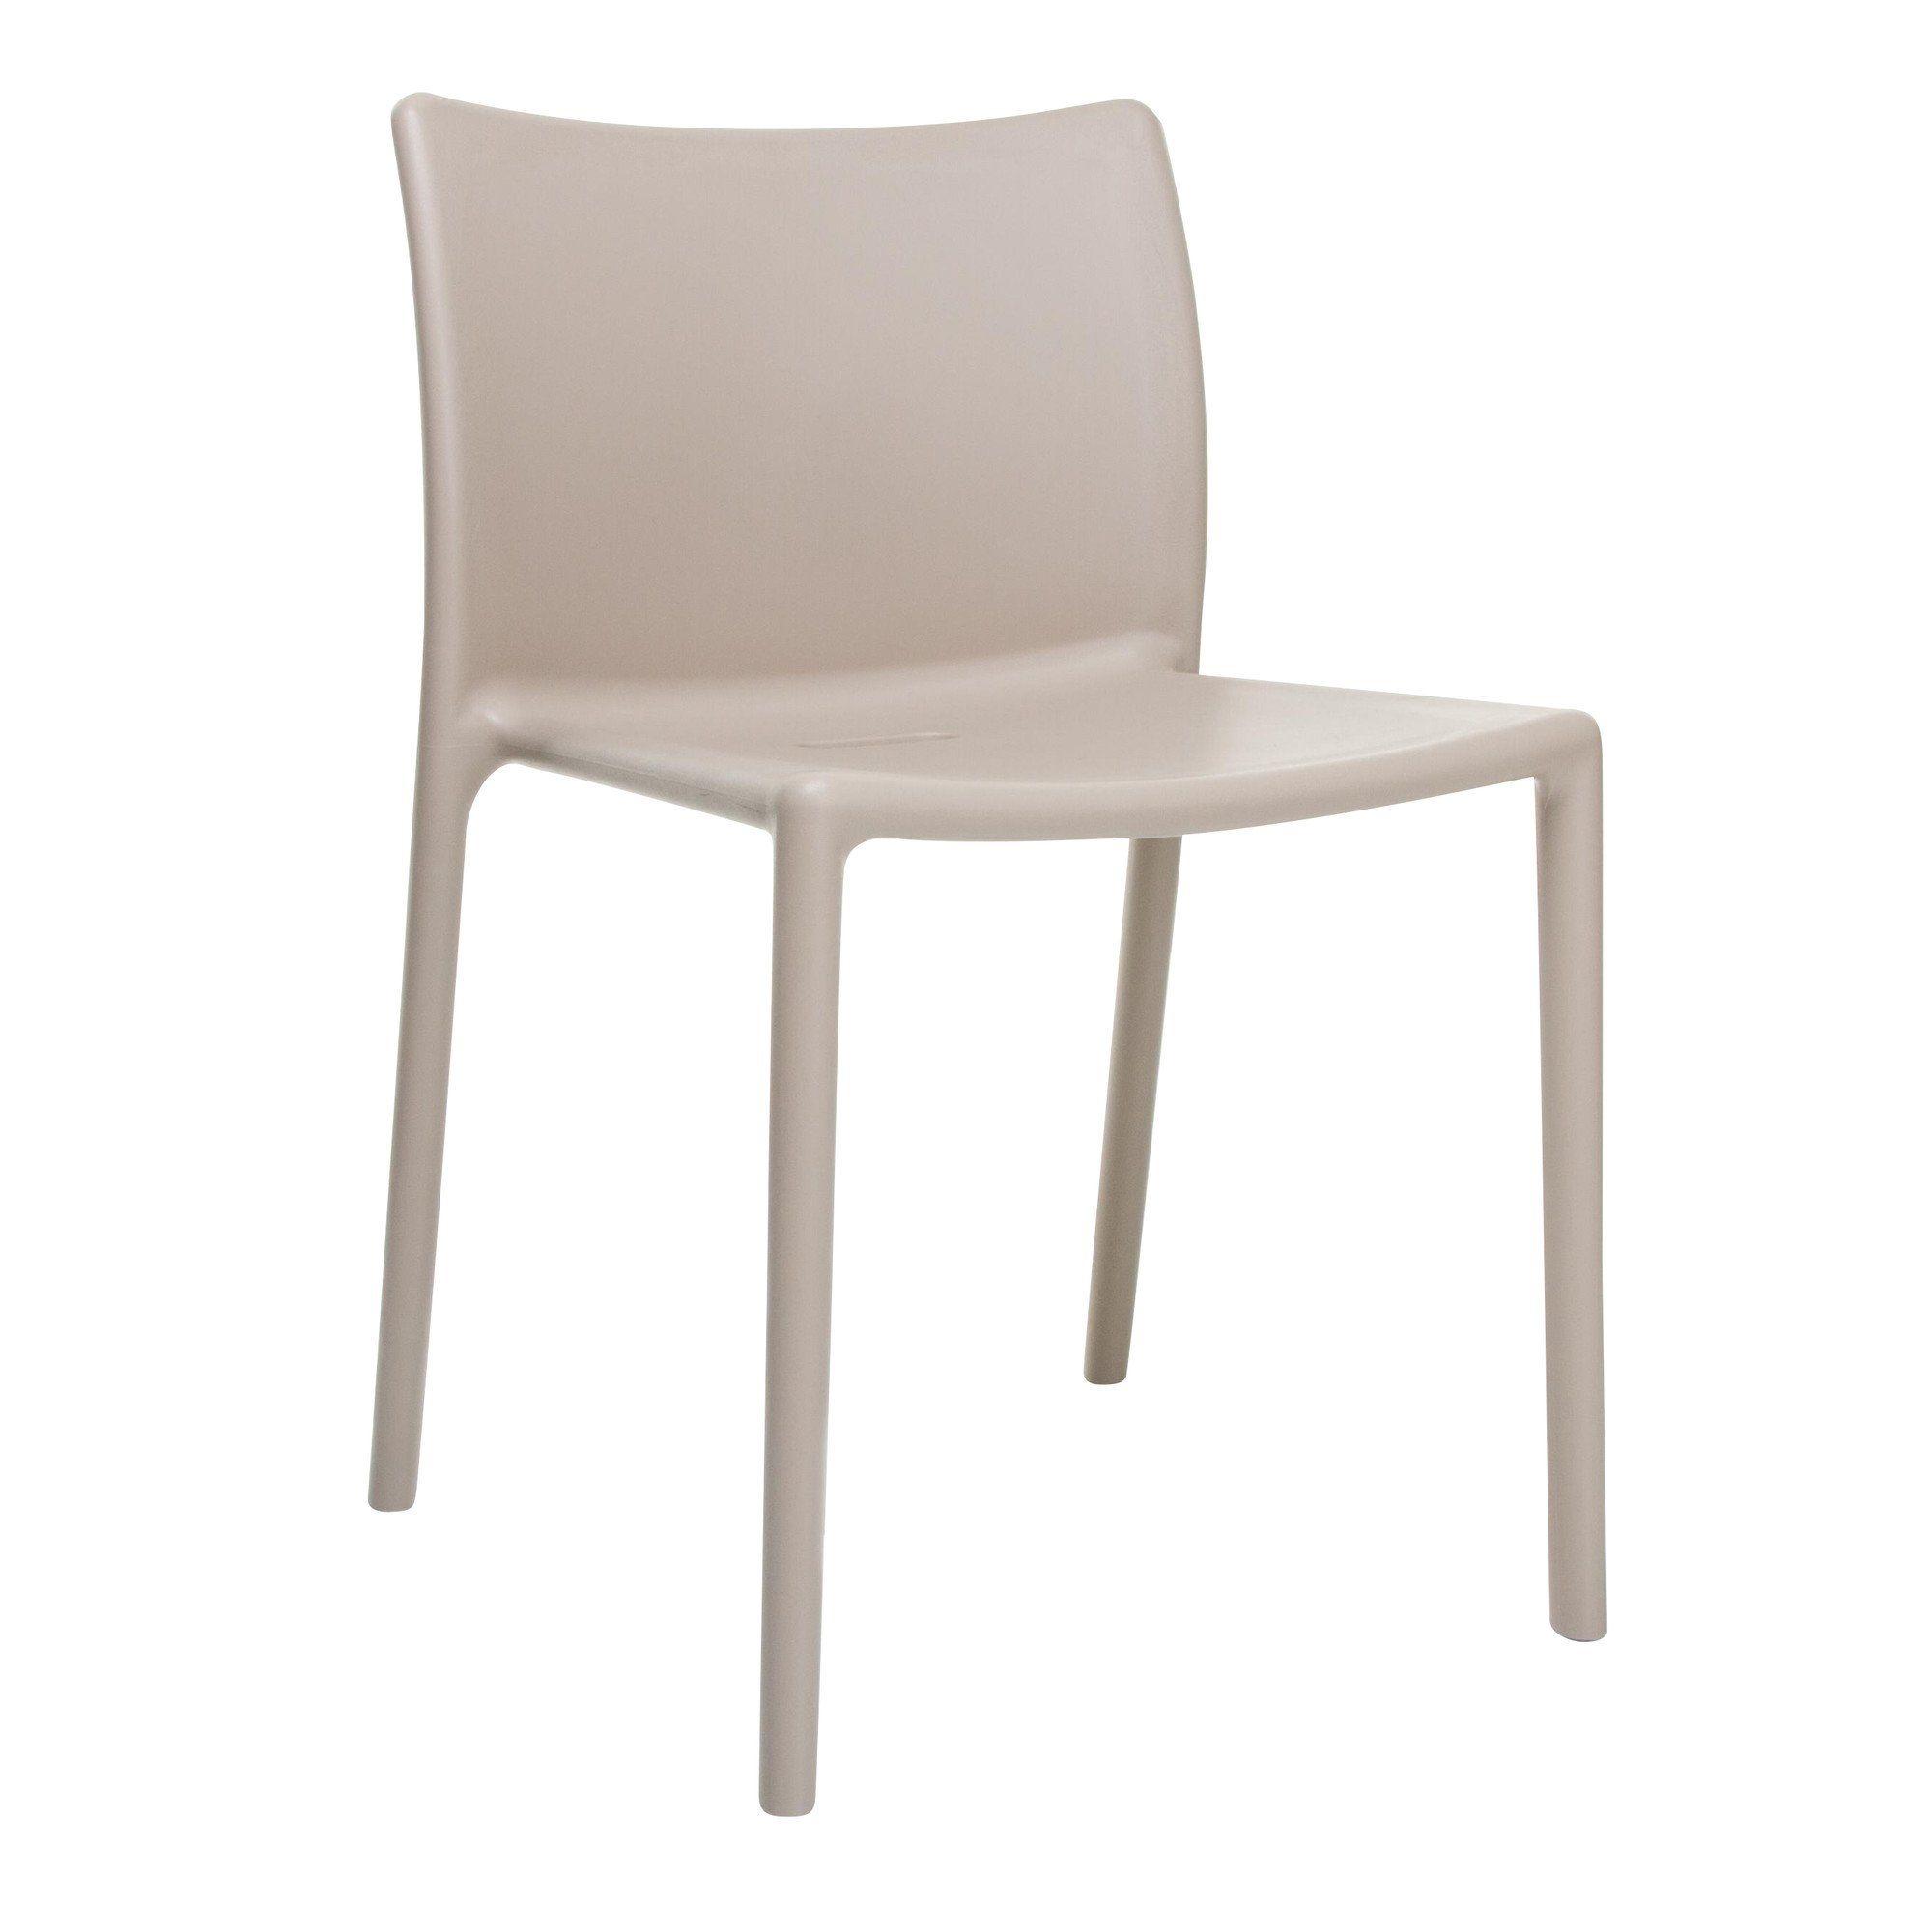 shop thomas news magis chairs chair bentzen loft